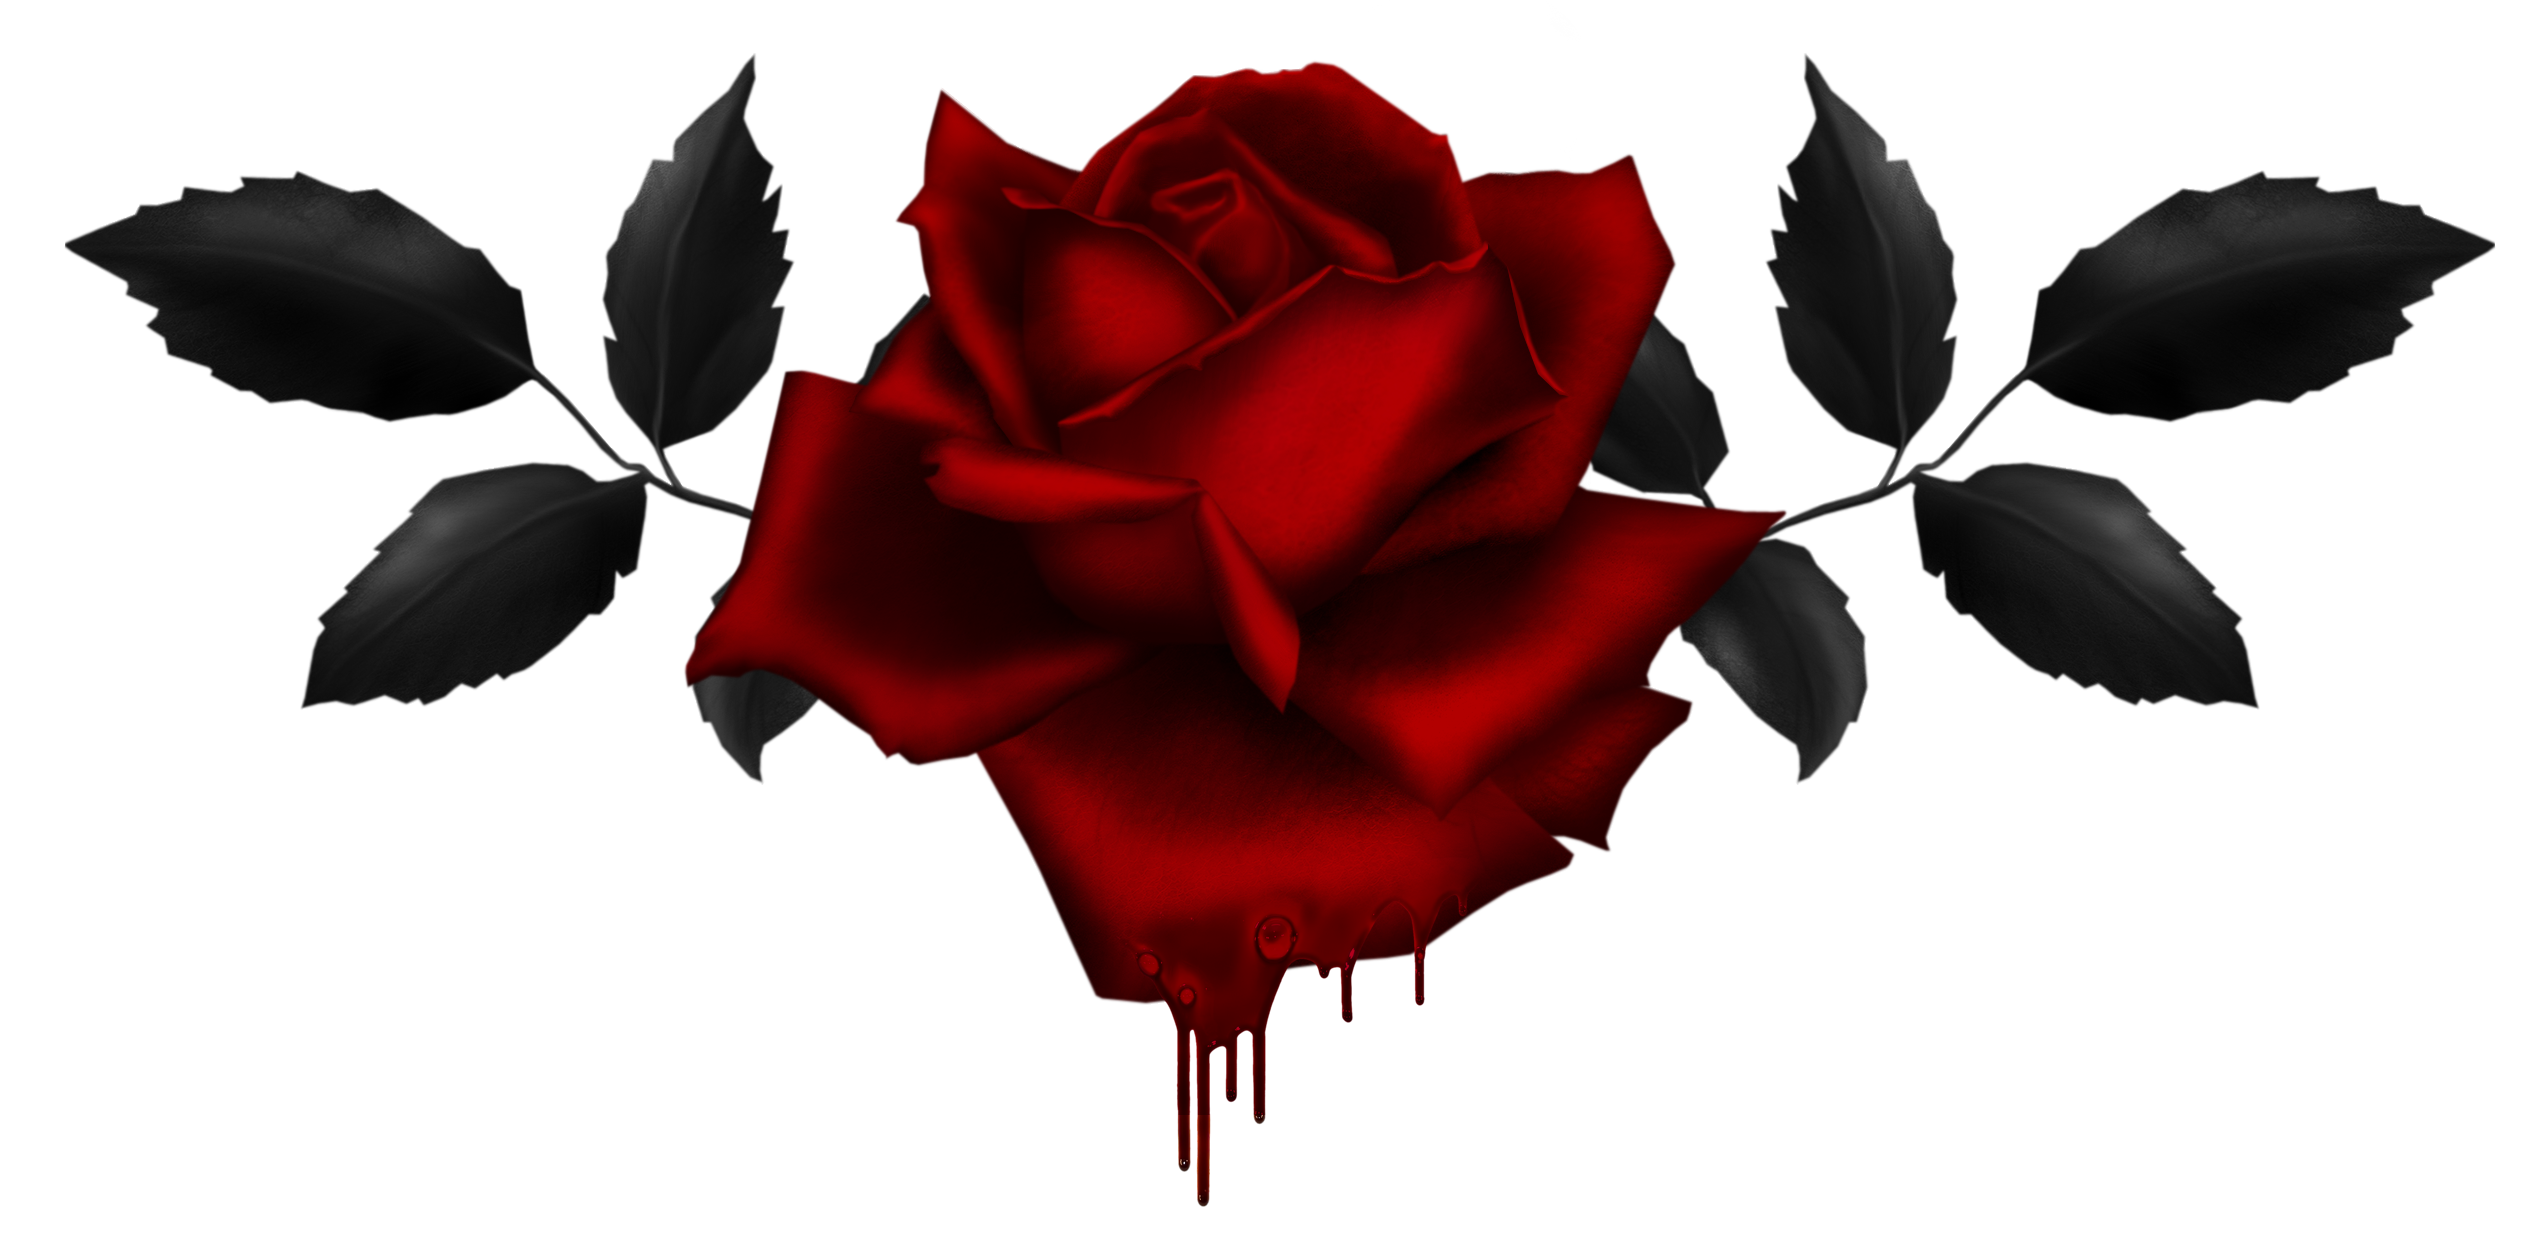 dongetrabi: Black Rose Drawing Bleeding Images